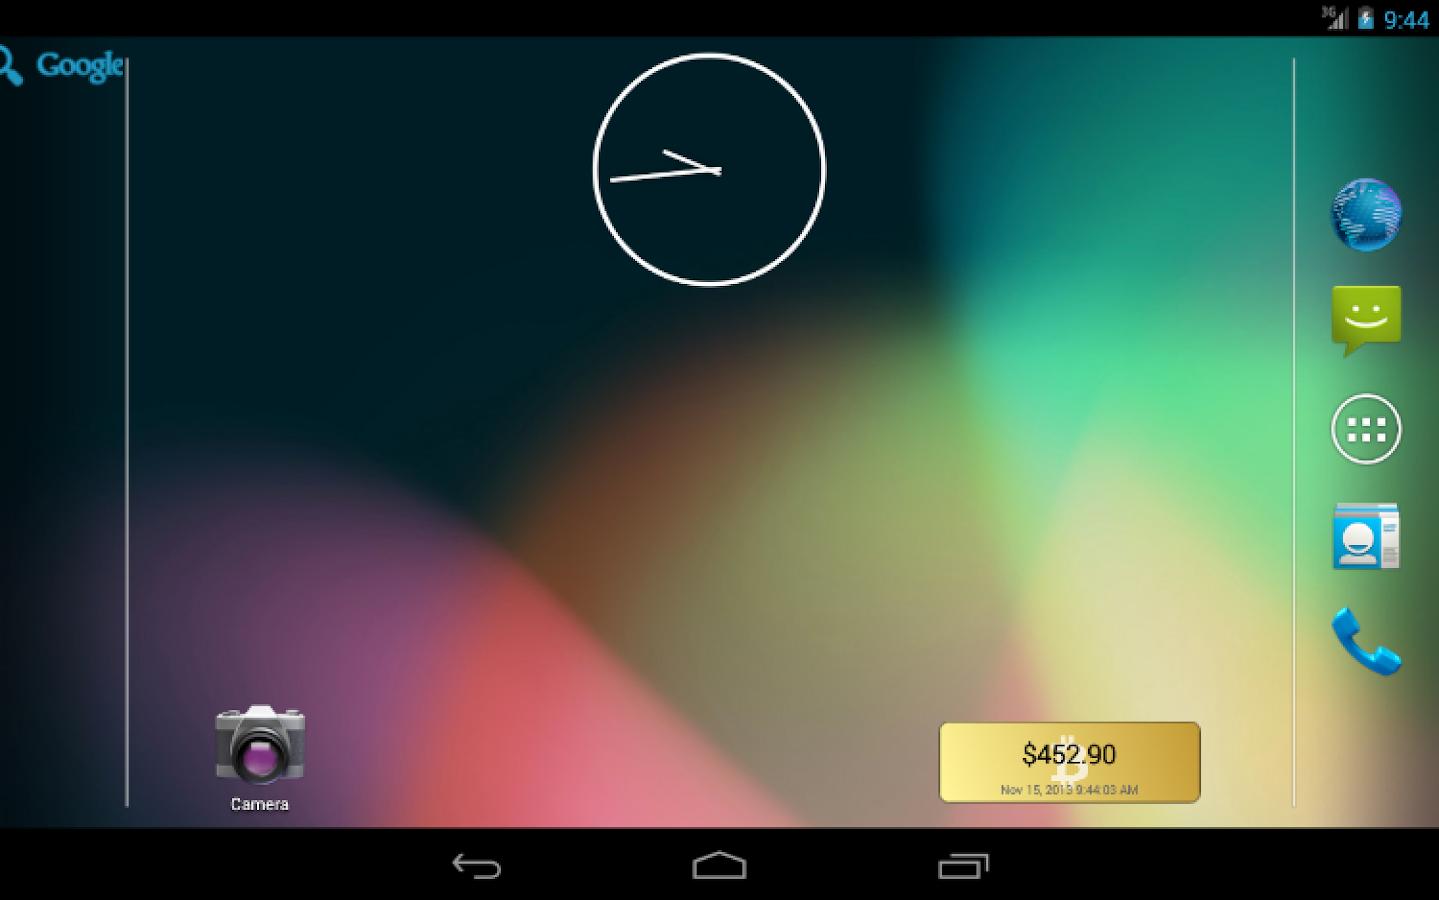 Bitcoin android widget : shopnow-q3zjjyu2 cf